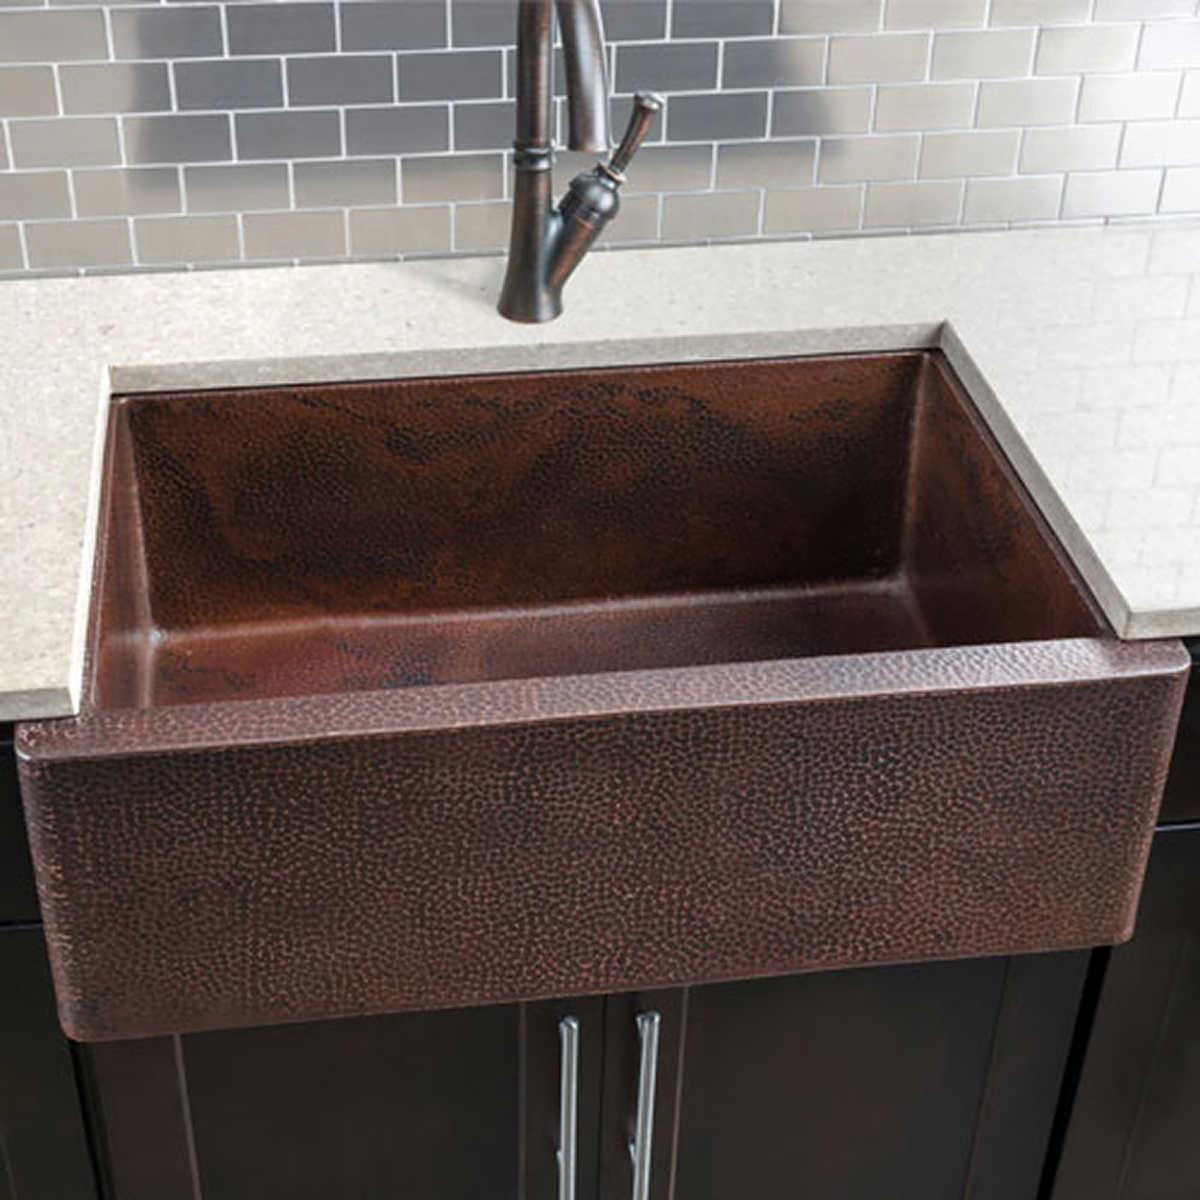 Undermount Farmhouse Kitchen Sink kitchen sinks | costco